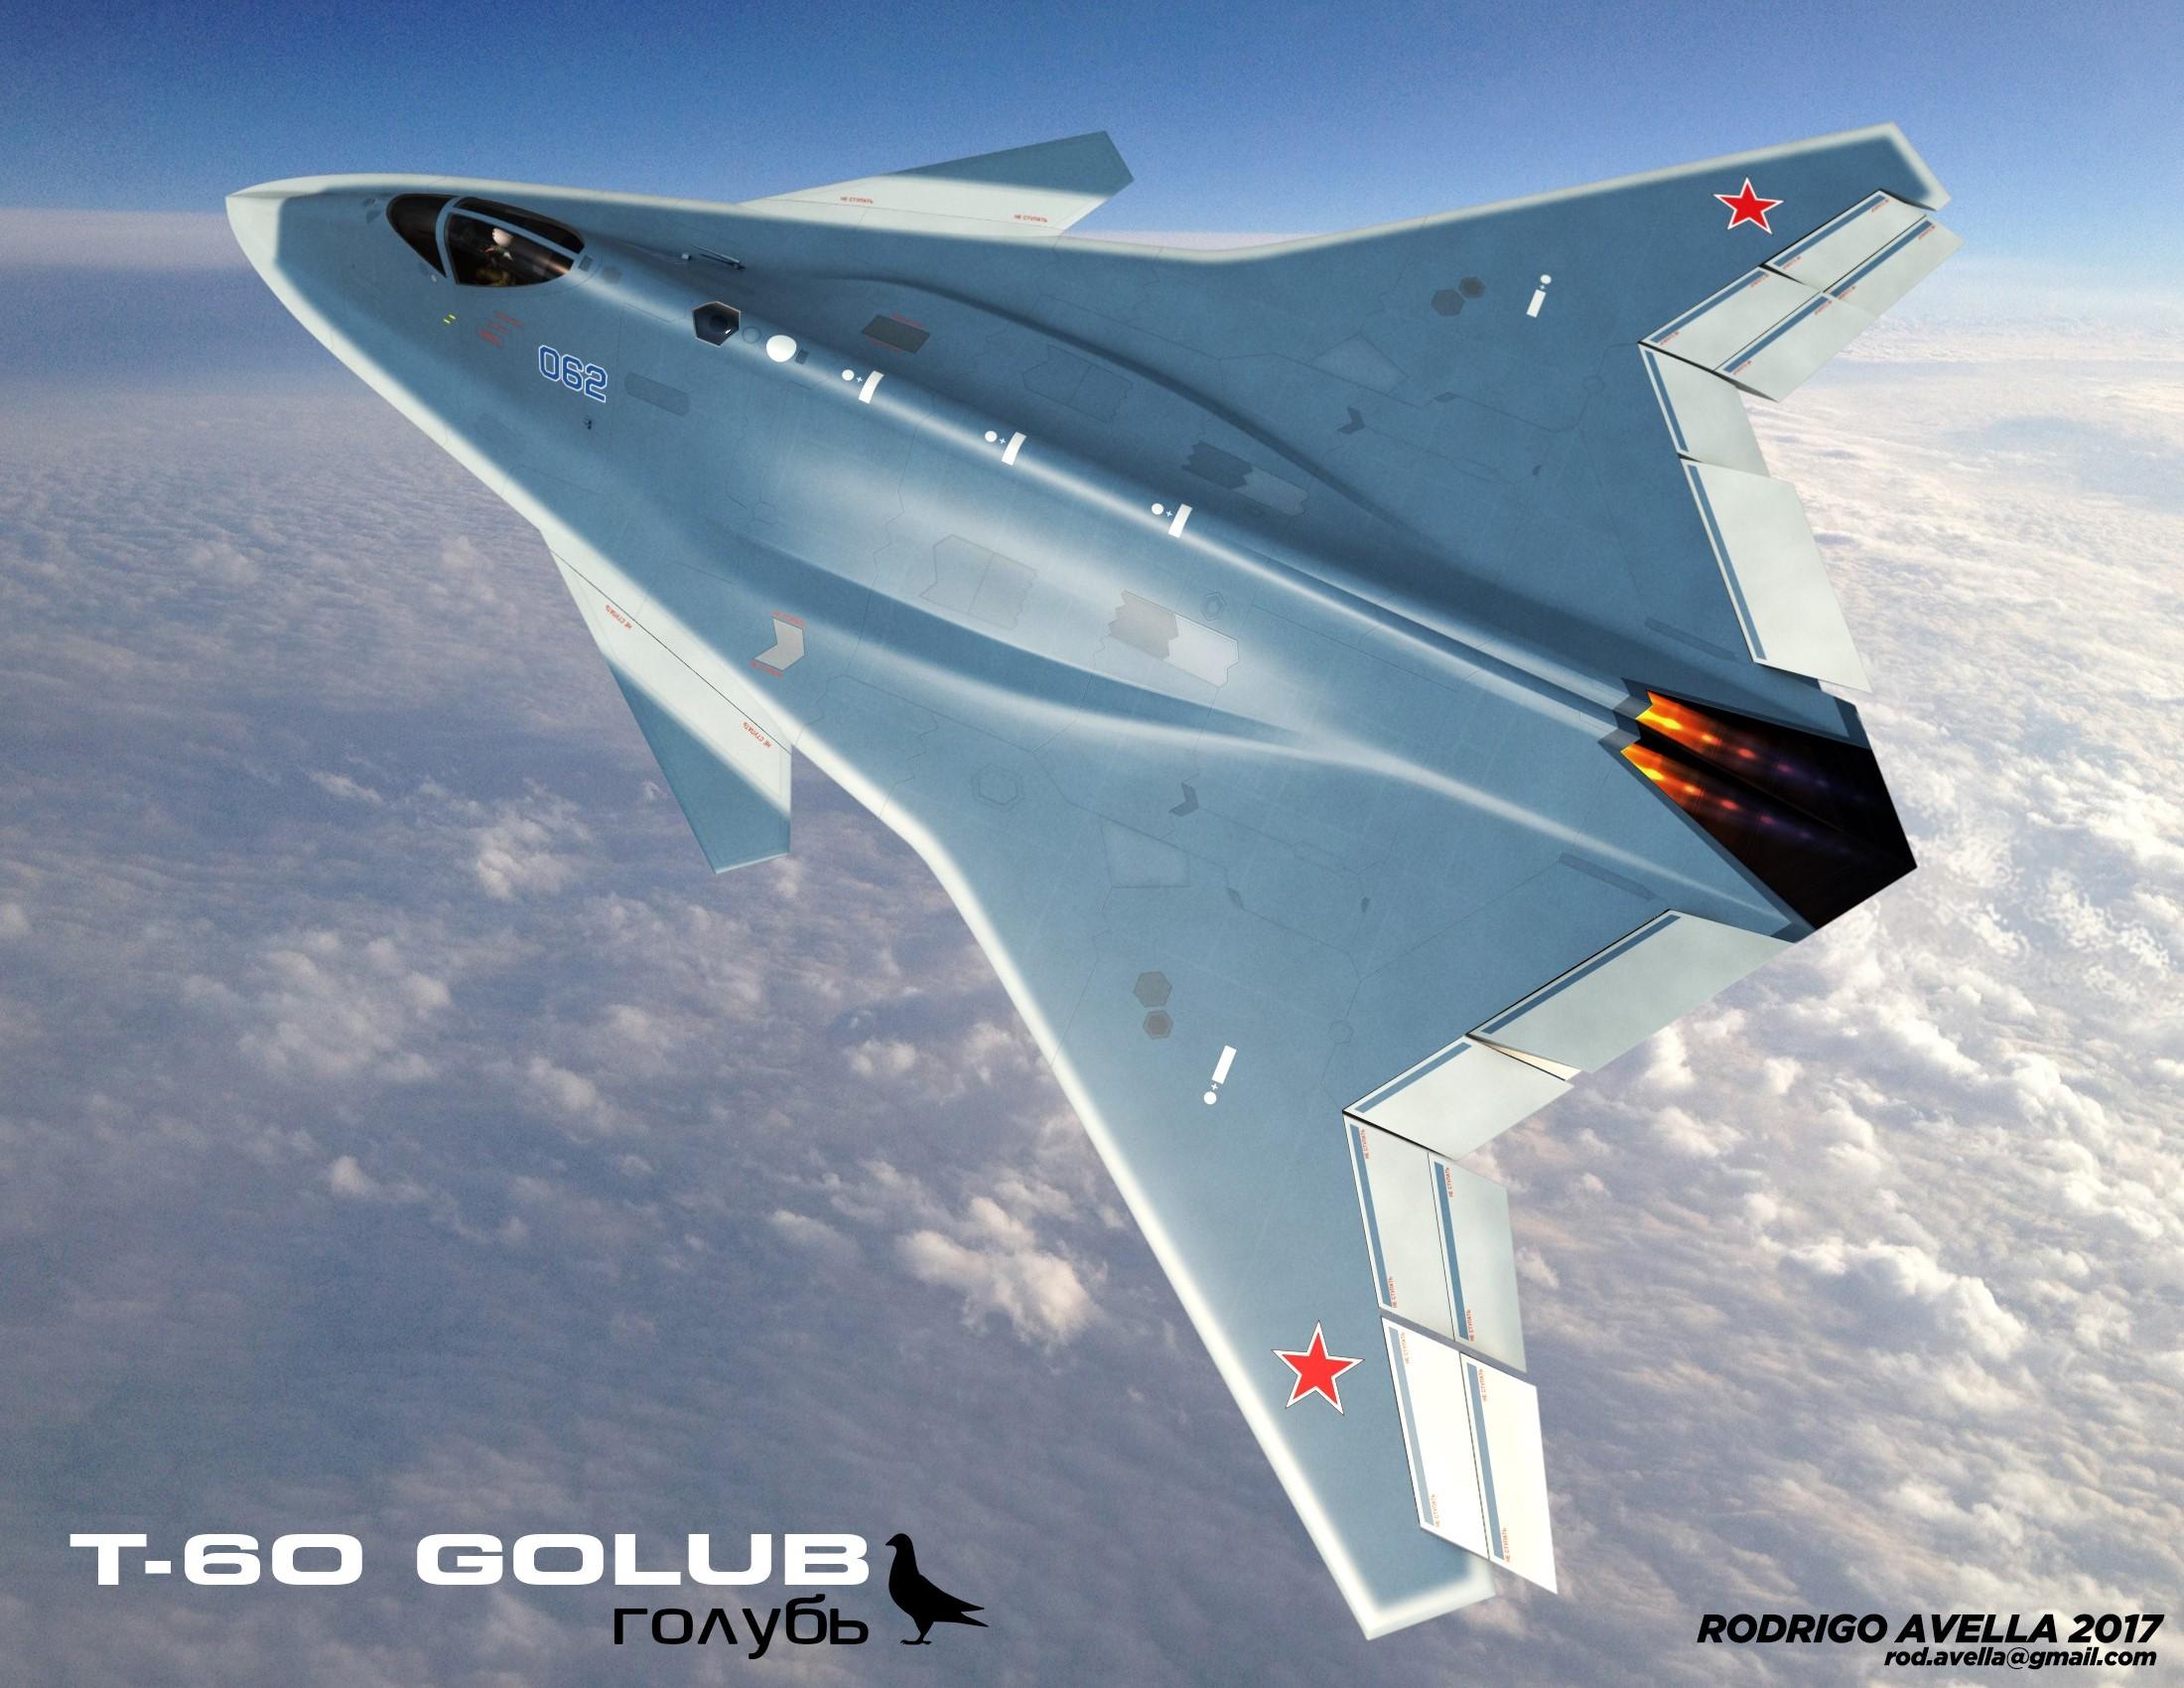 russian_sixth_generation_concept_fighter_aircraft_by_rodrigoavella-db36u0a.jpg